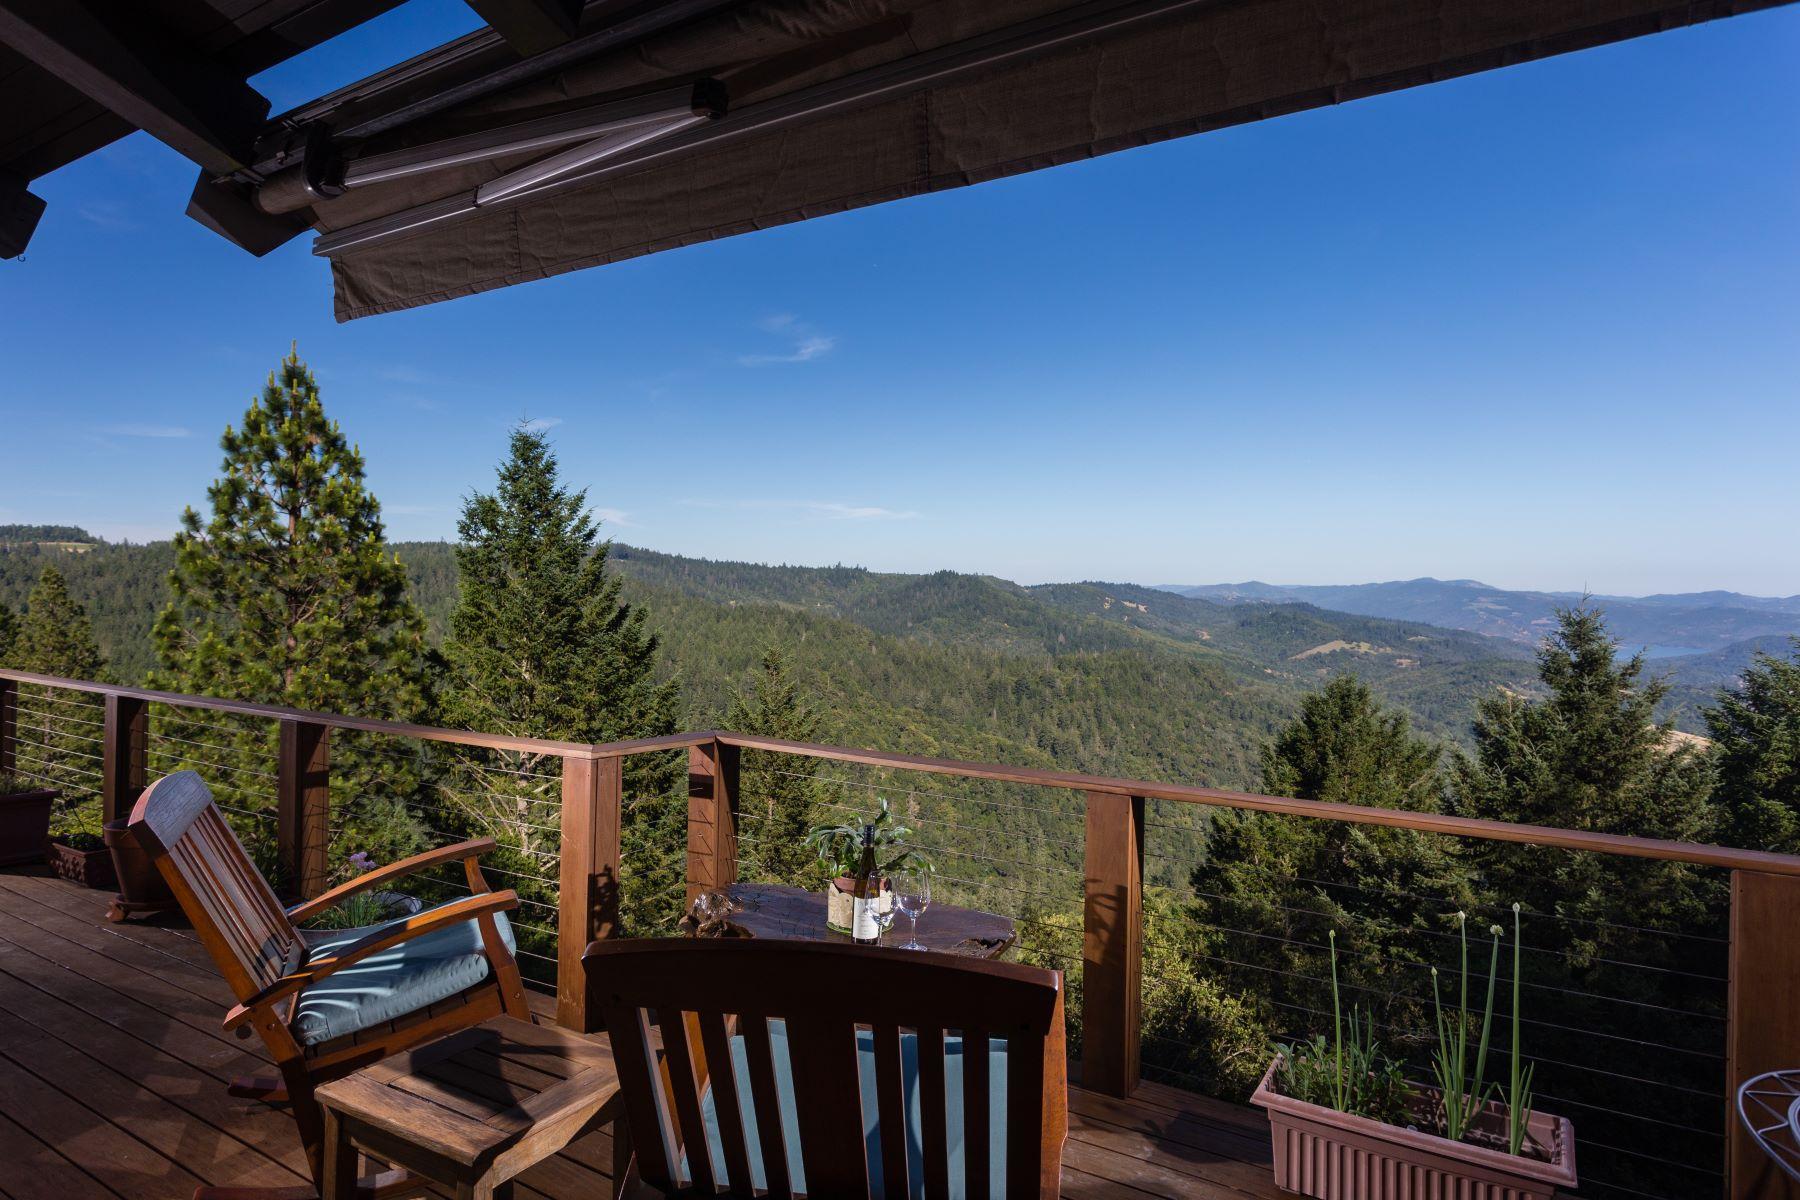 獨棟家庭住宅 為 出售 在 Stunning View Property 1325 Crestmont Drive Angwin, 加利福尼亞州 94508 美國